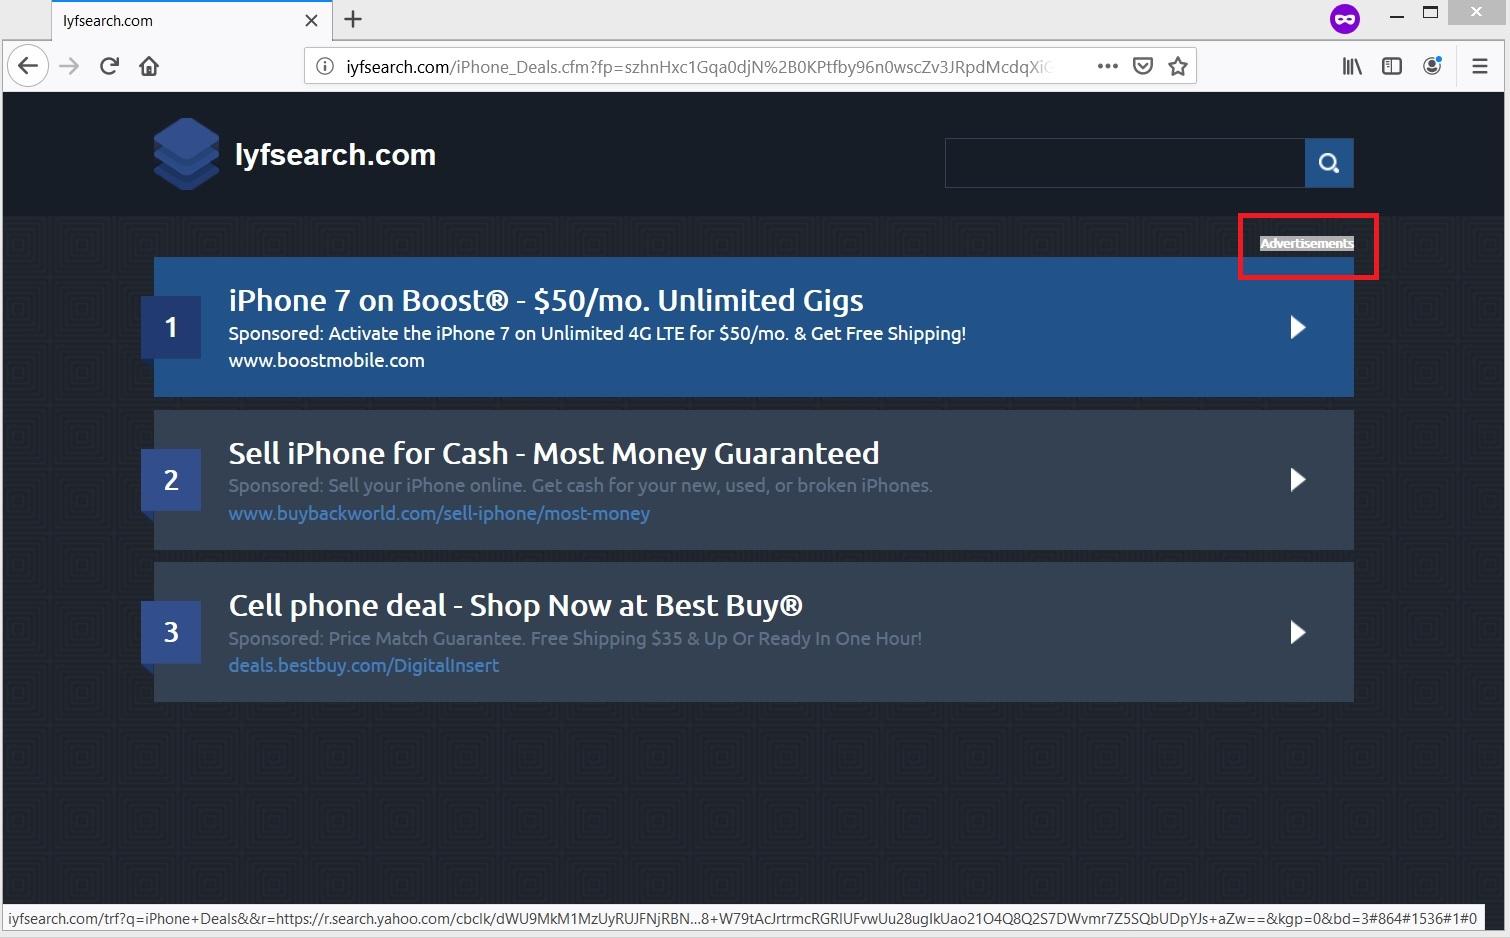 iyfsearch-com-fake-offers-sensorstechforum